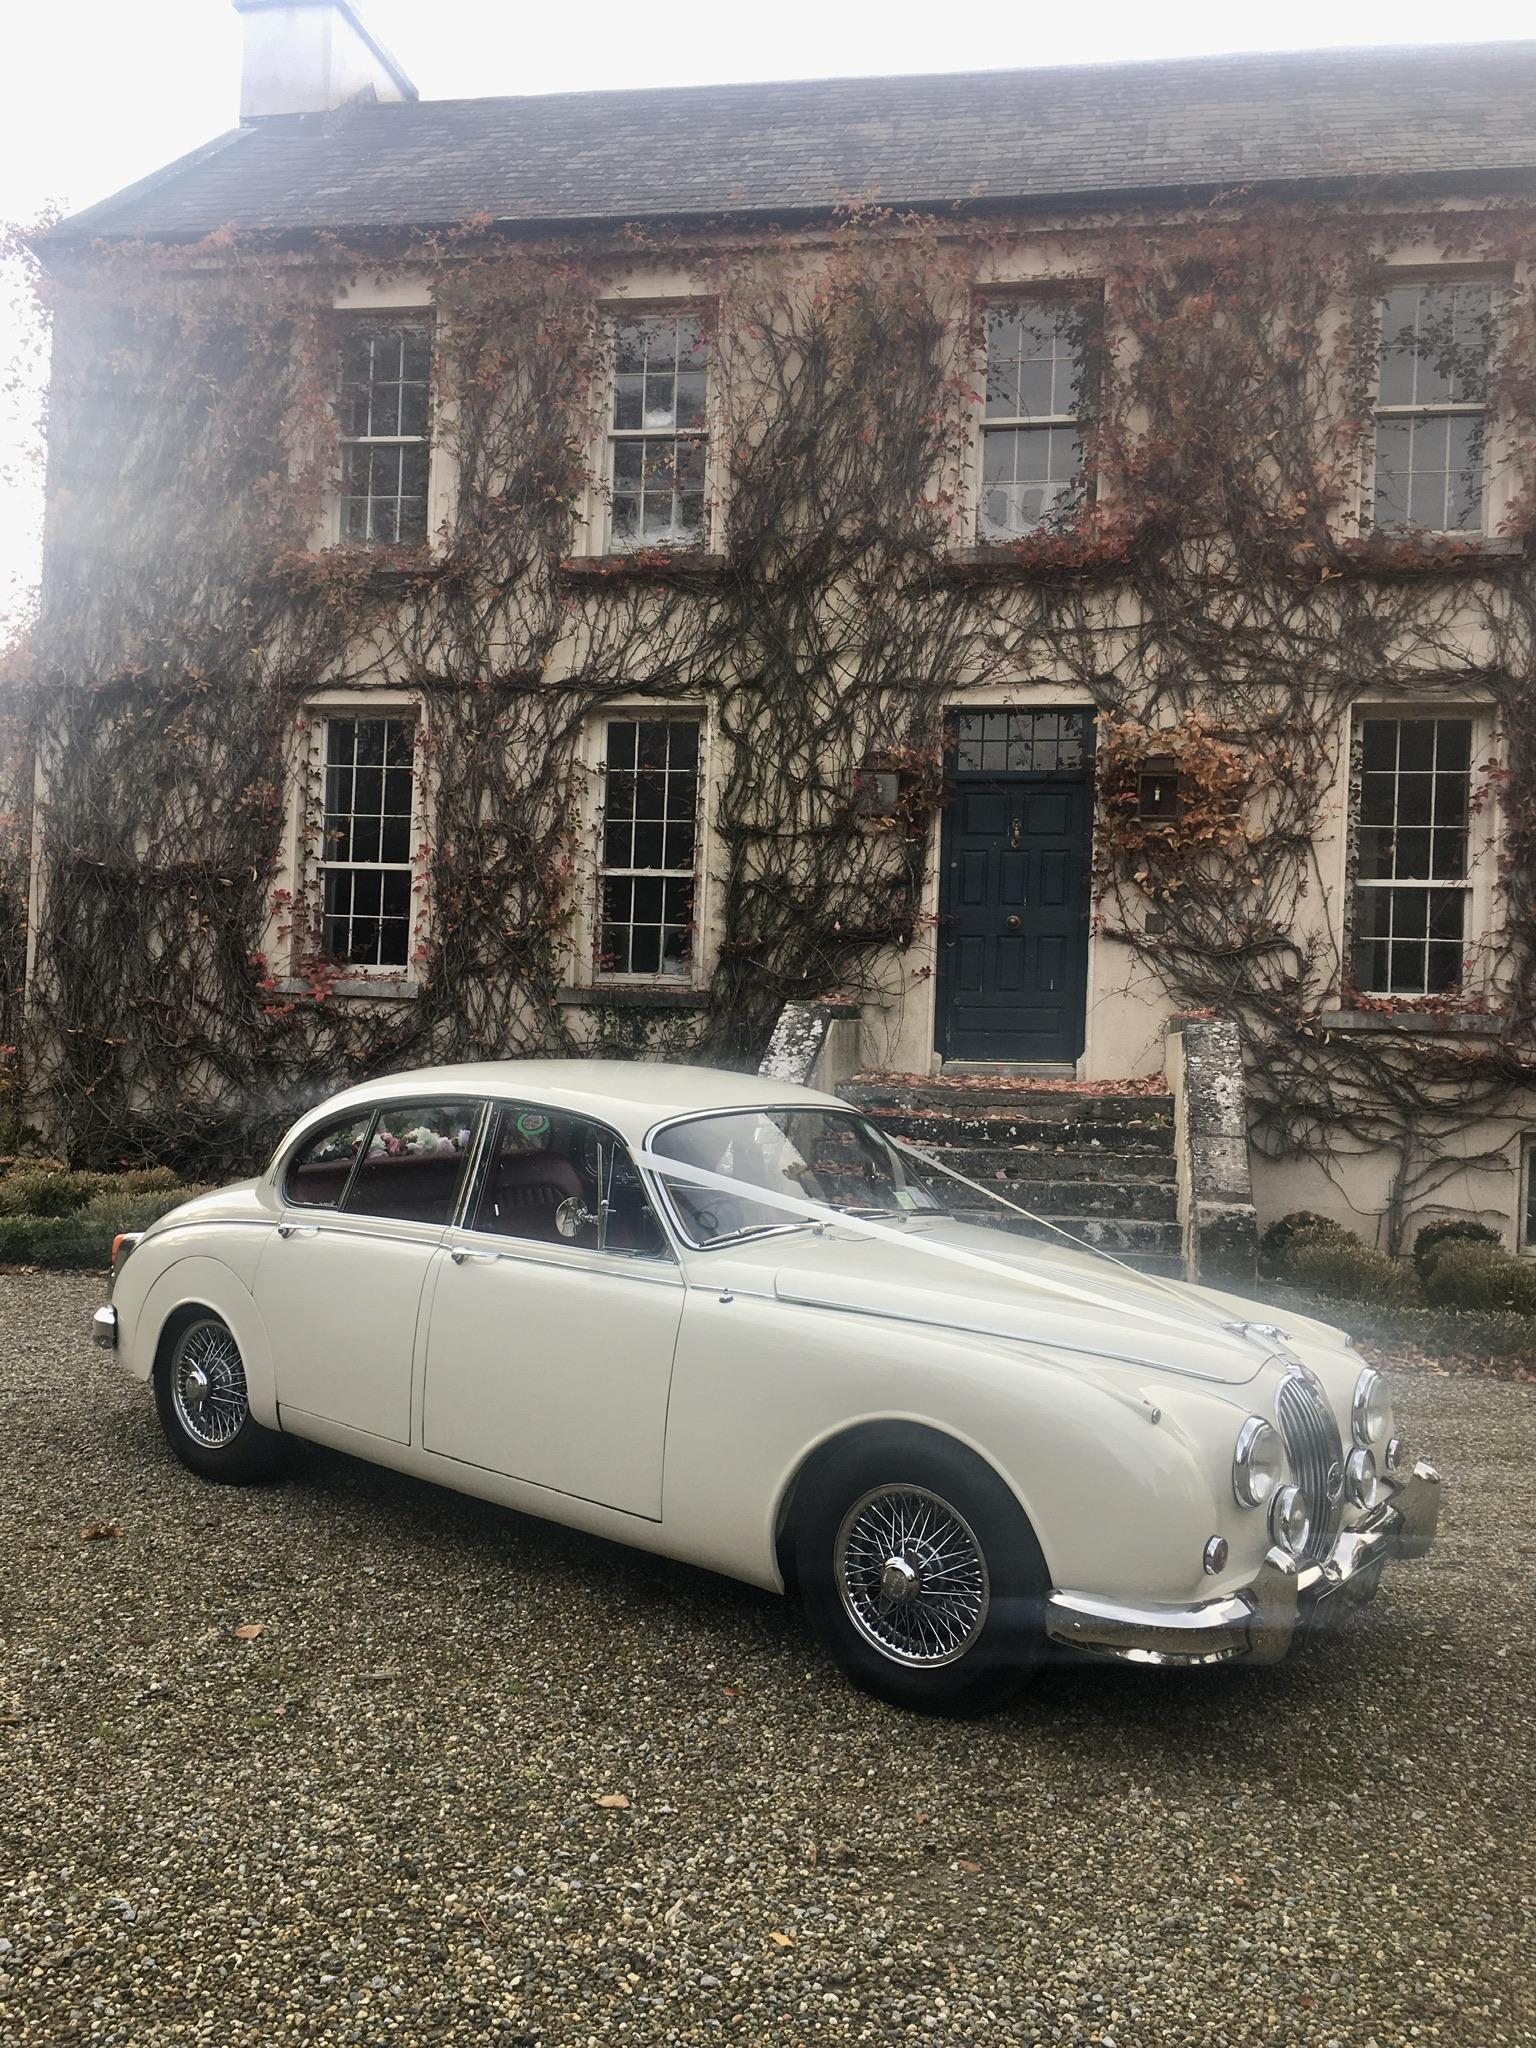 A Classic White wedding car